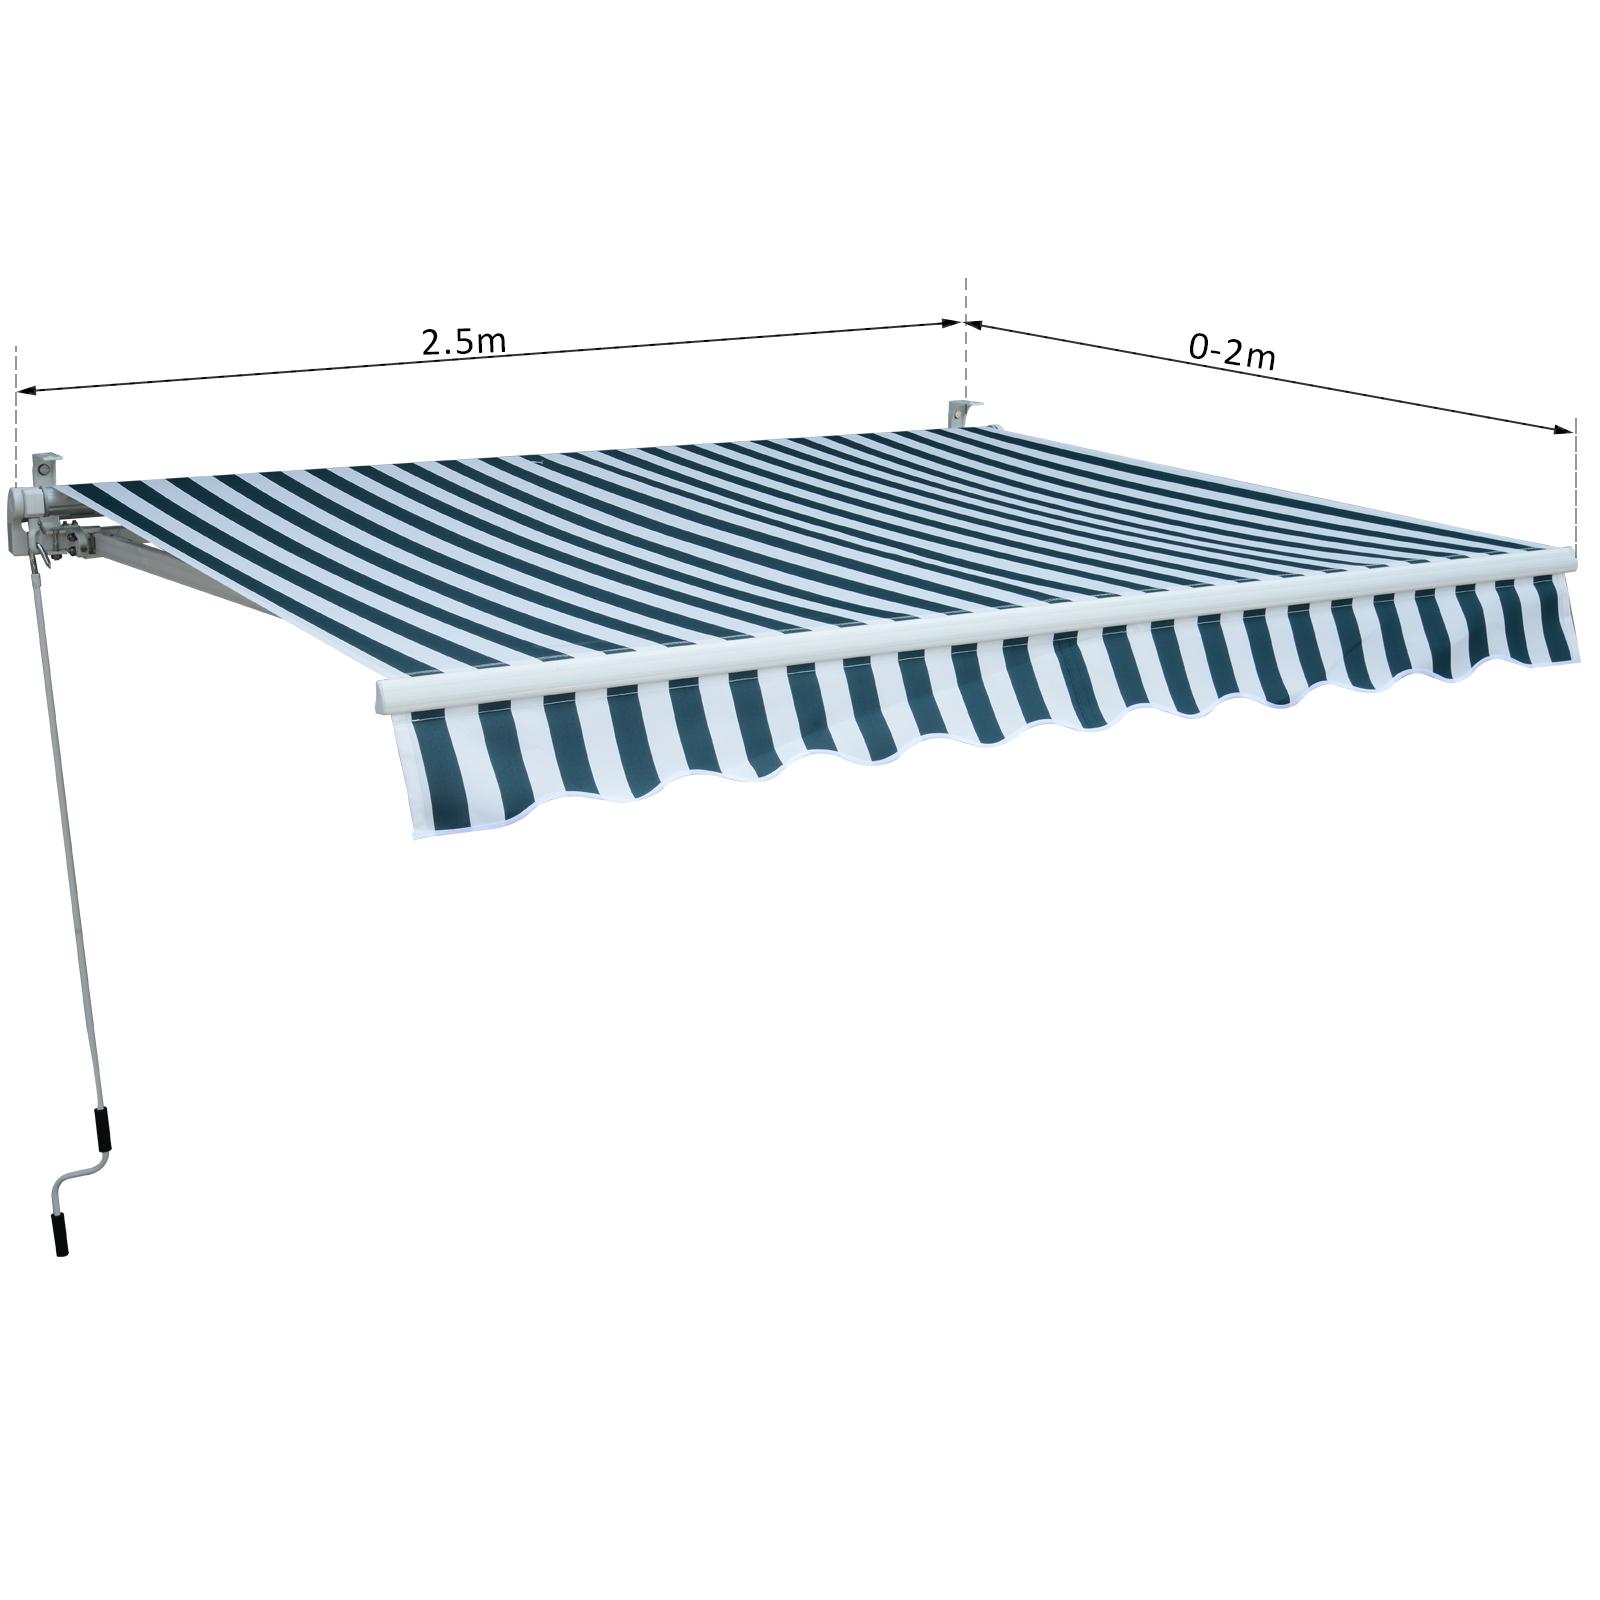 Garden-Patio-Manual-Awning-Canopy-Sun-Shade-Shelter-Retractable-4-Size-5-Colour thumbnail 21